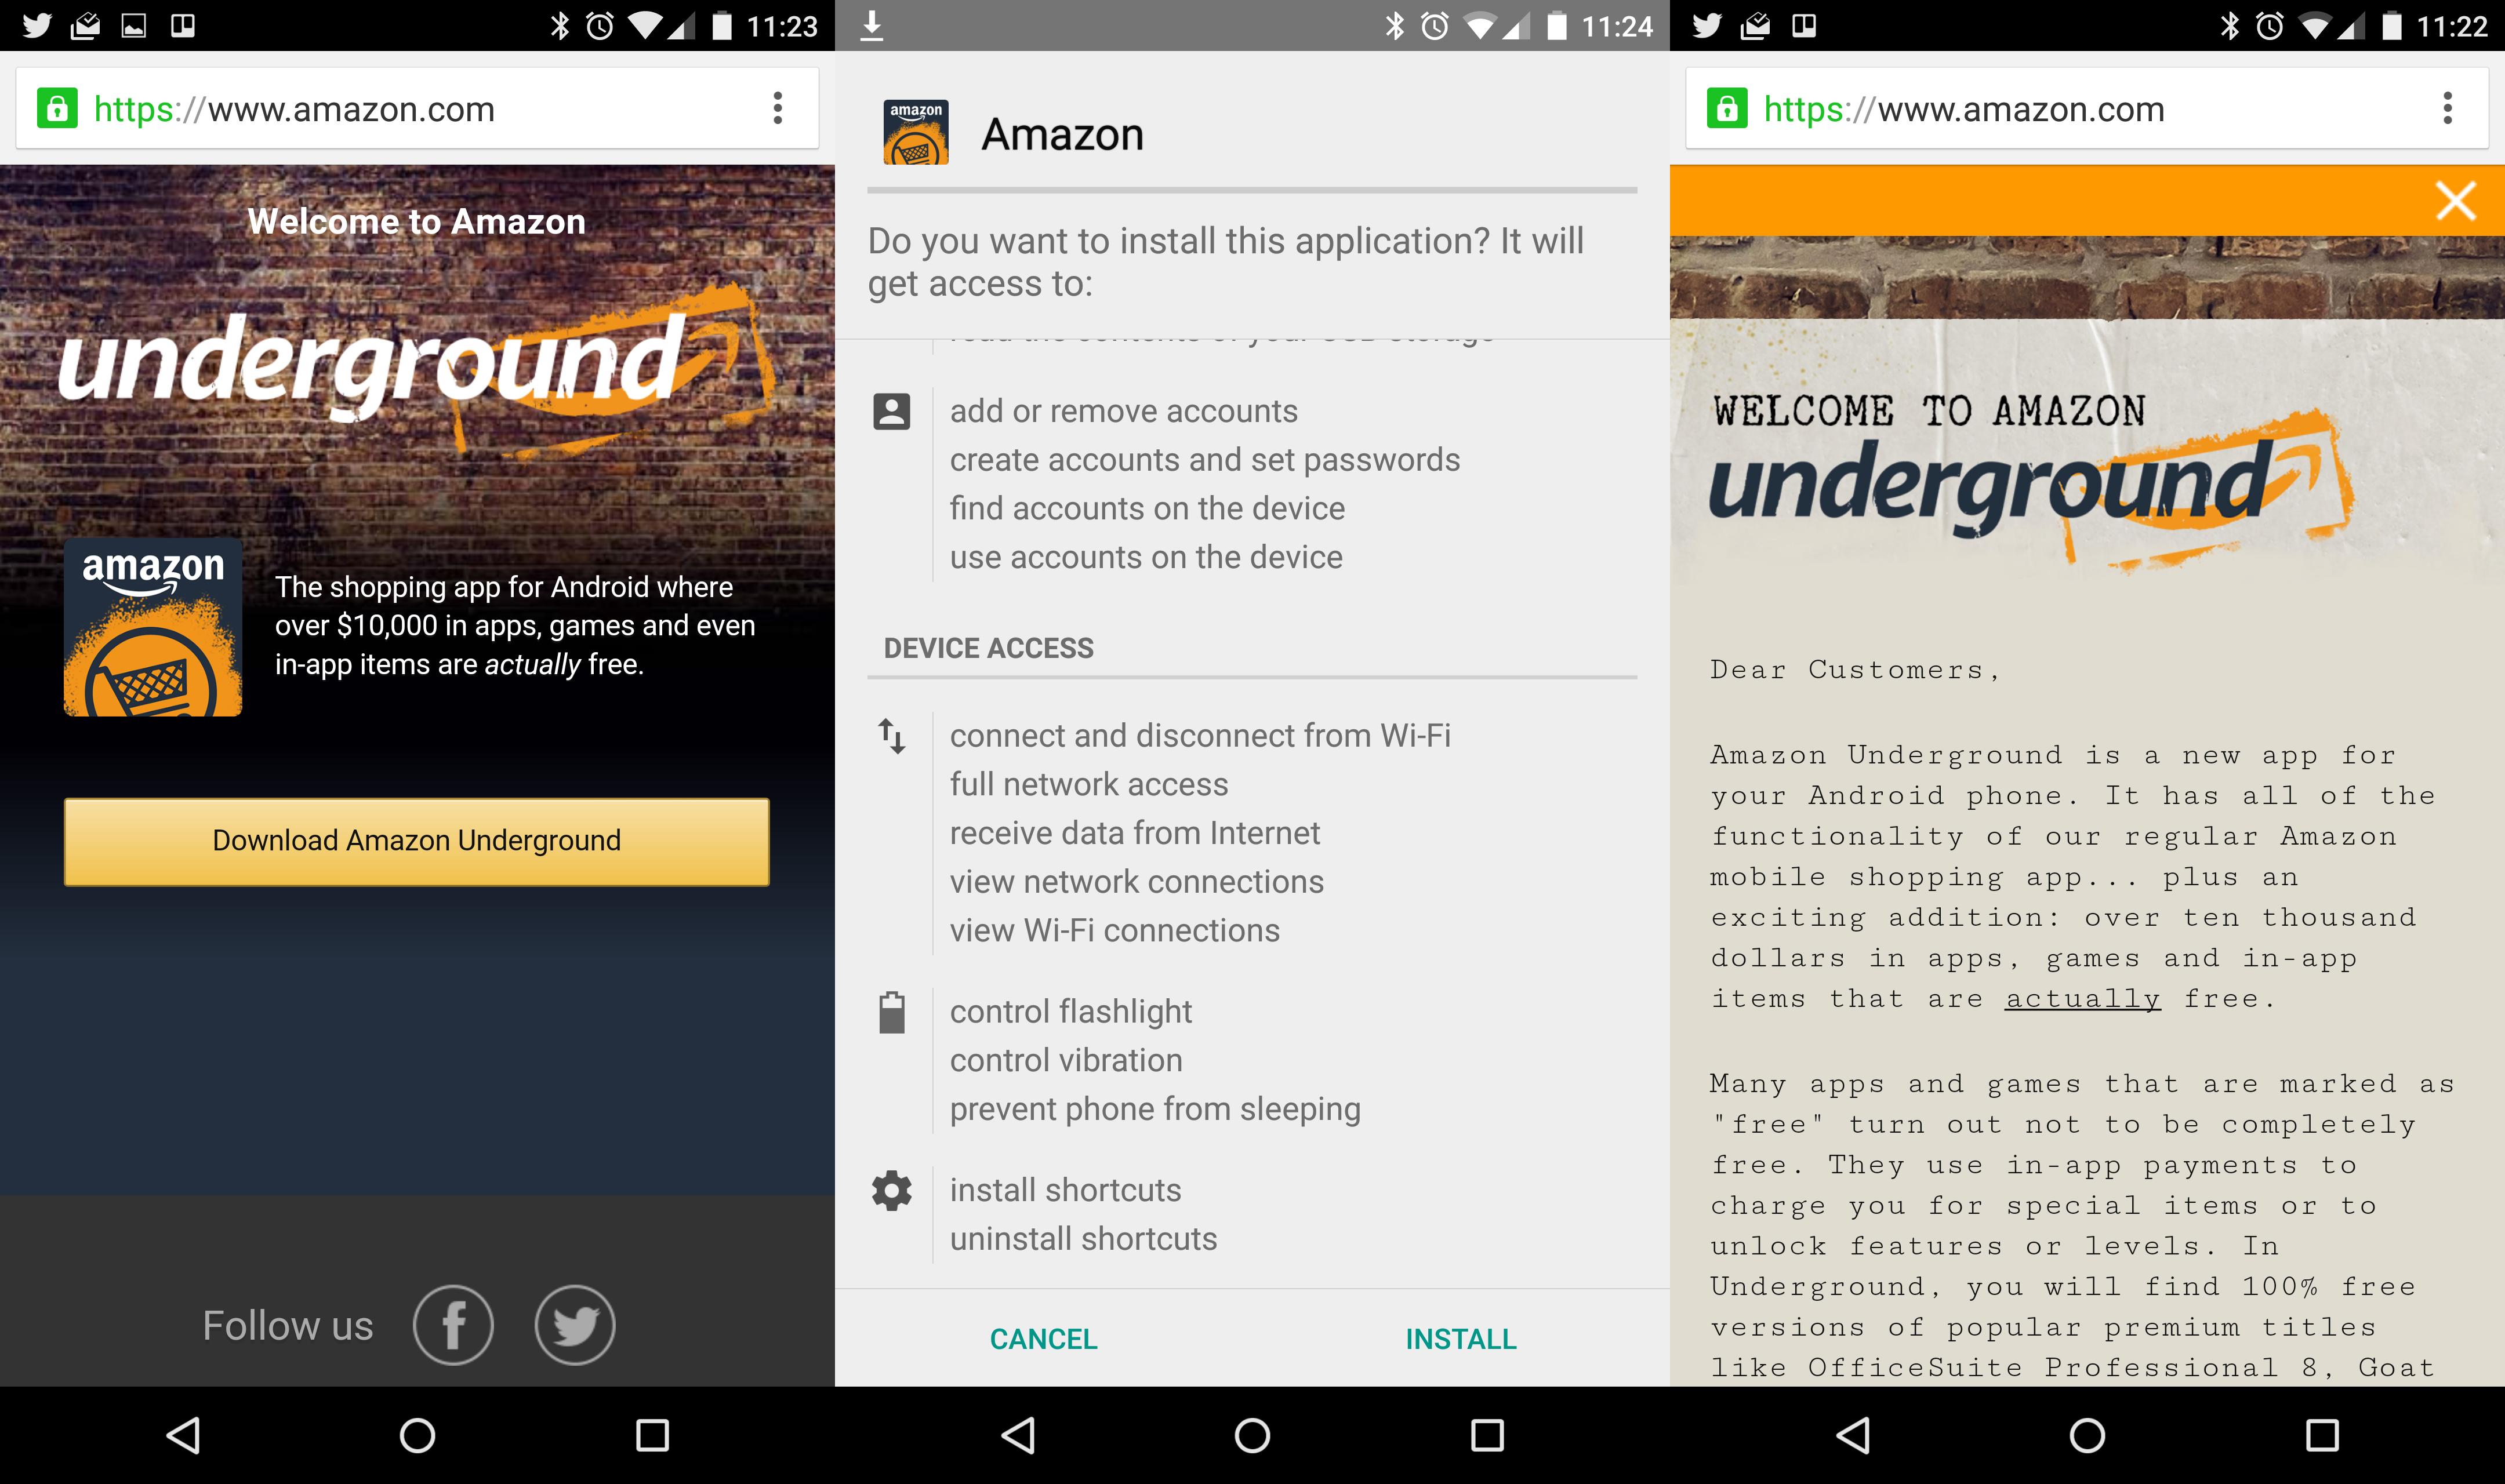 Amazoncom apps games - Amazon Underground